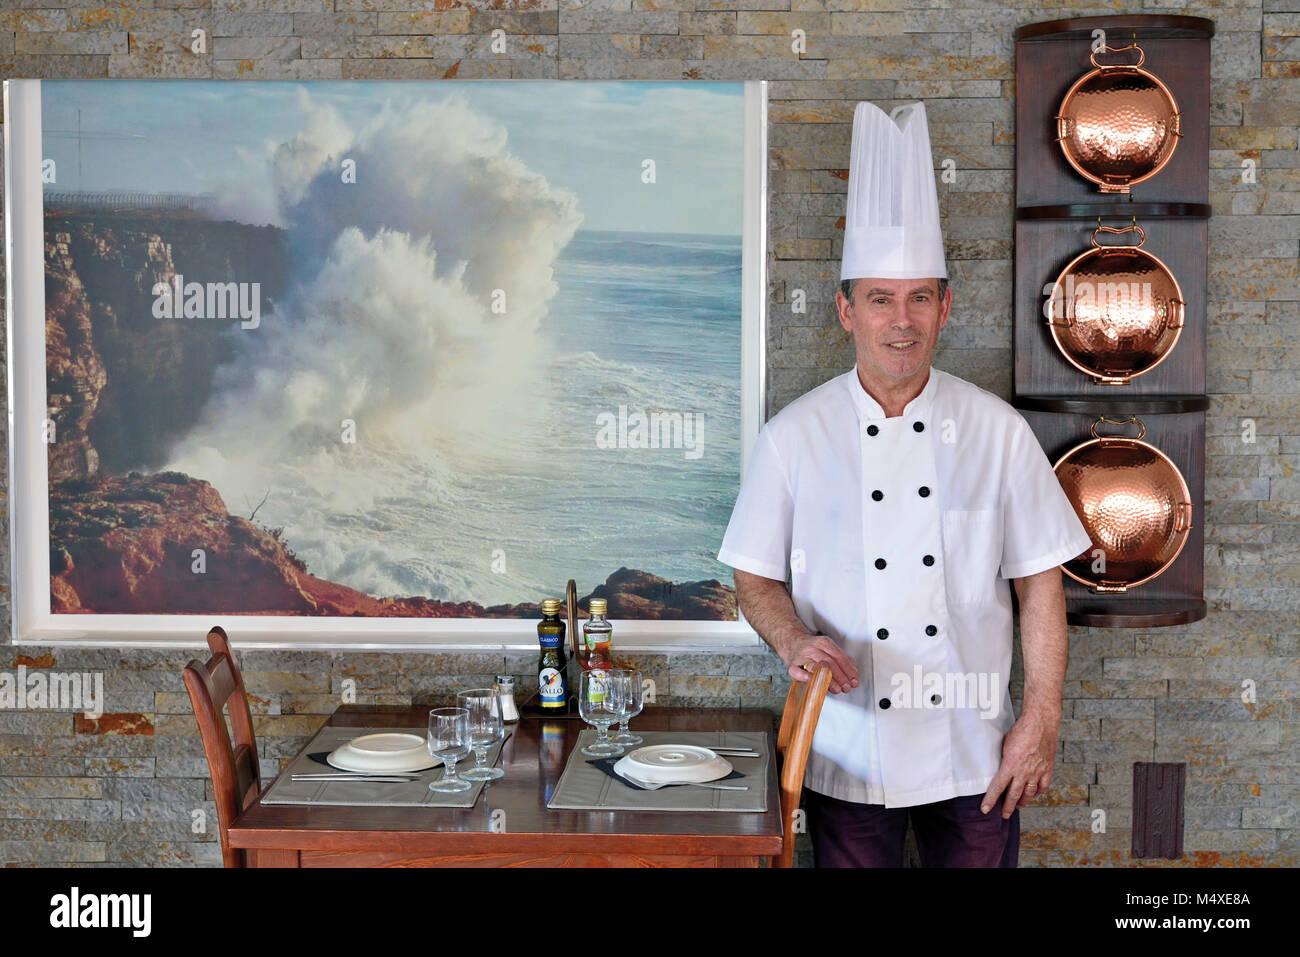 Gilberto chef en cuisine Furtado outfit dans son restaurant 'Gigi' à Sagres Photo Stock